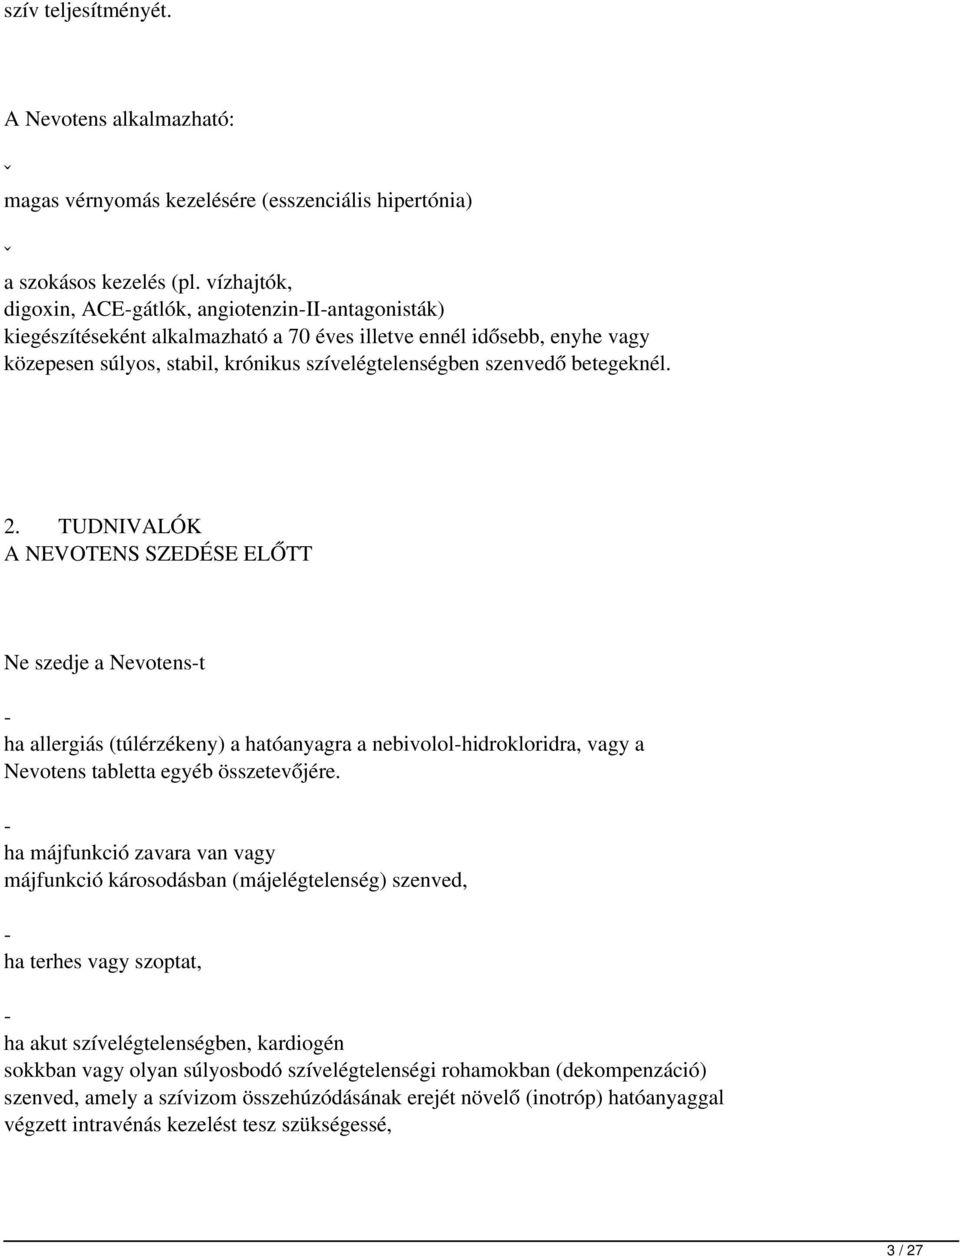 FOSICARD PLUS 20 mg/12,5 mg tabletta